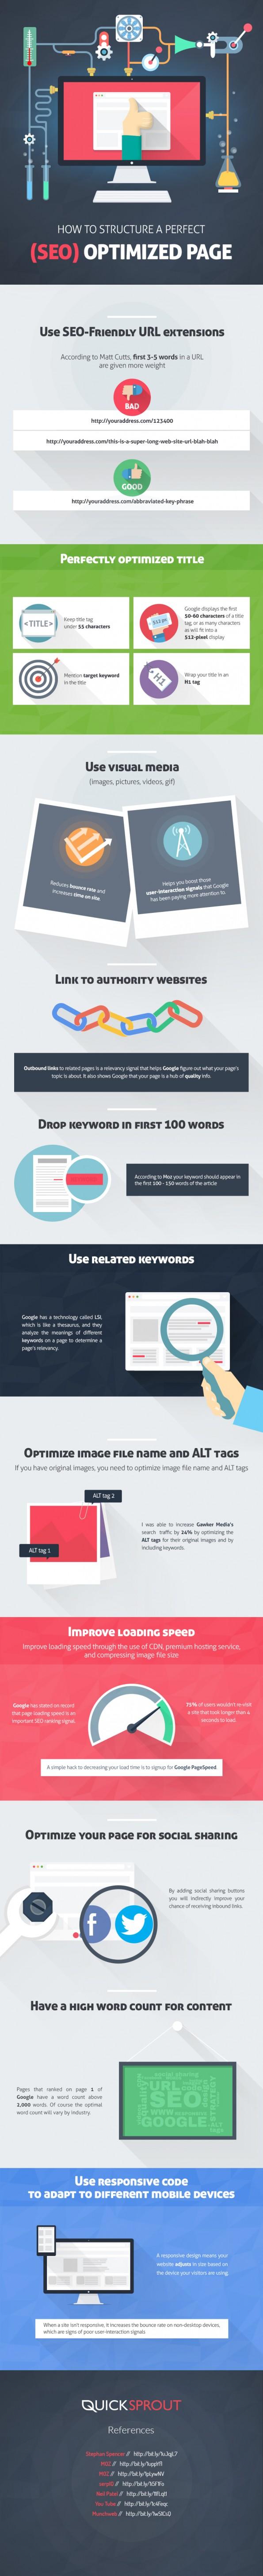 seo-checklist zo maak je je site vindbaar infographic